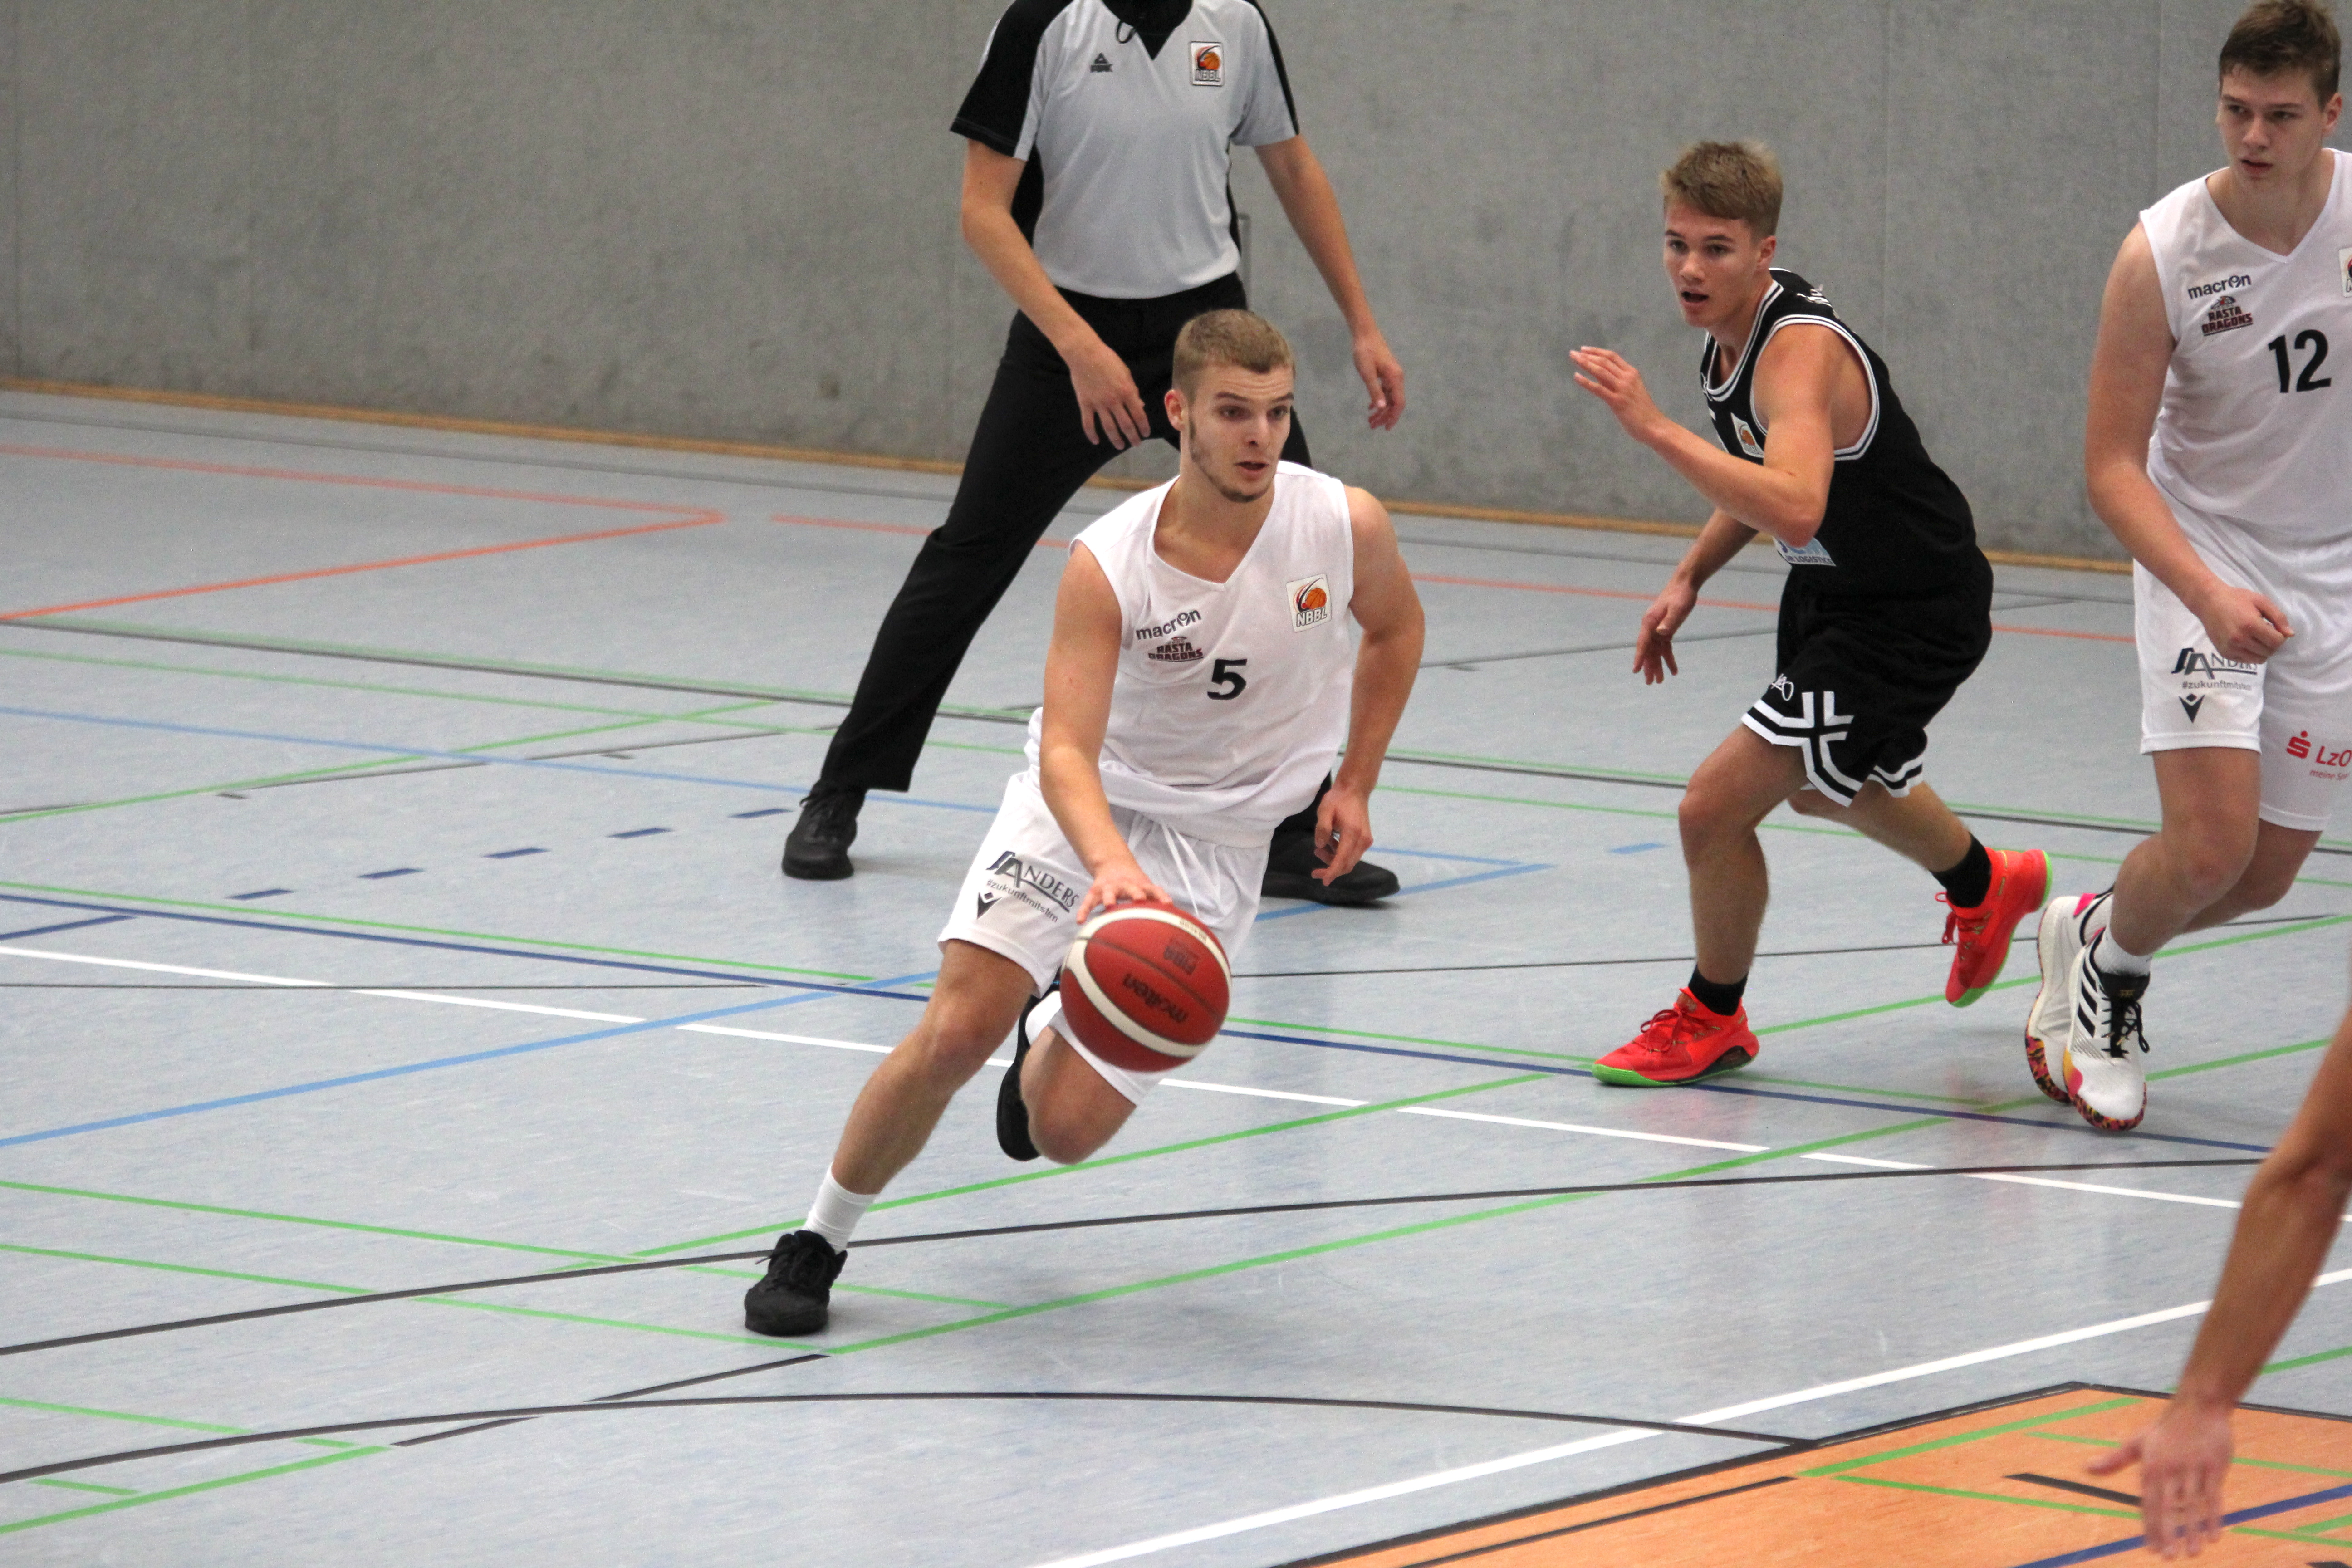 NBBL_20-21_YOUNG-RASTA-DRAGONS_Münster_Spieltag1_Torge-Buthmann_9